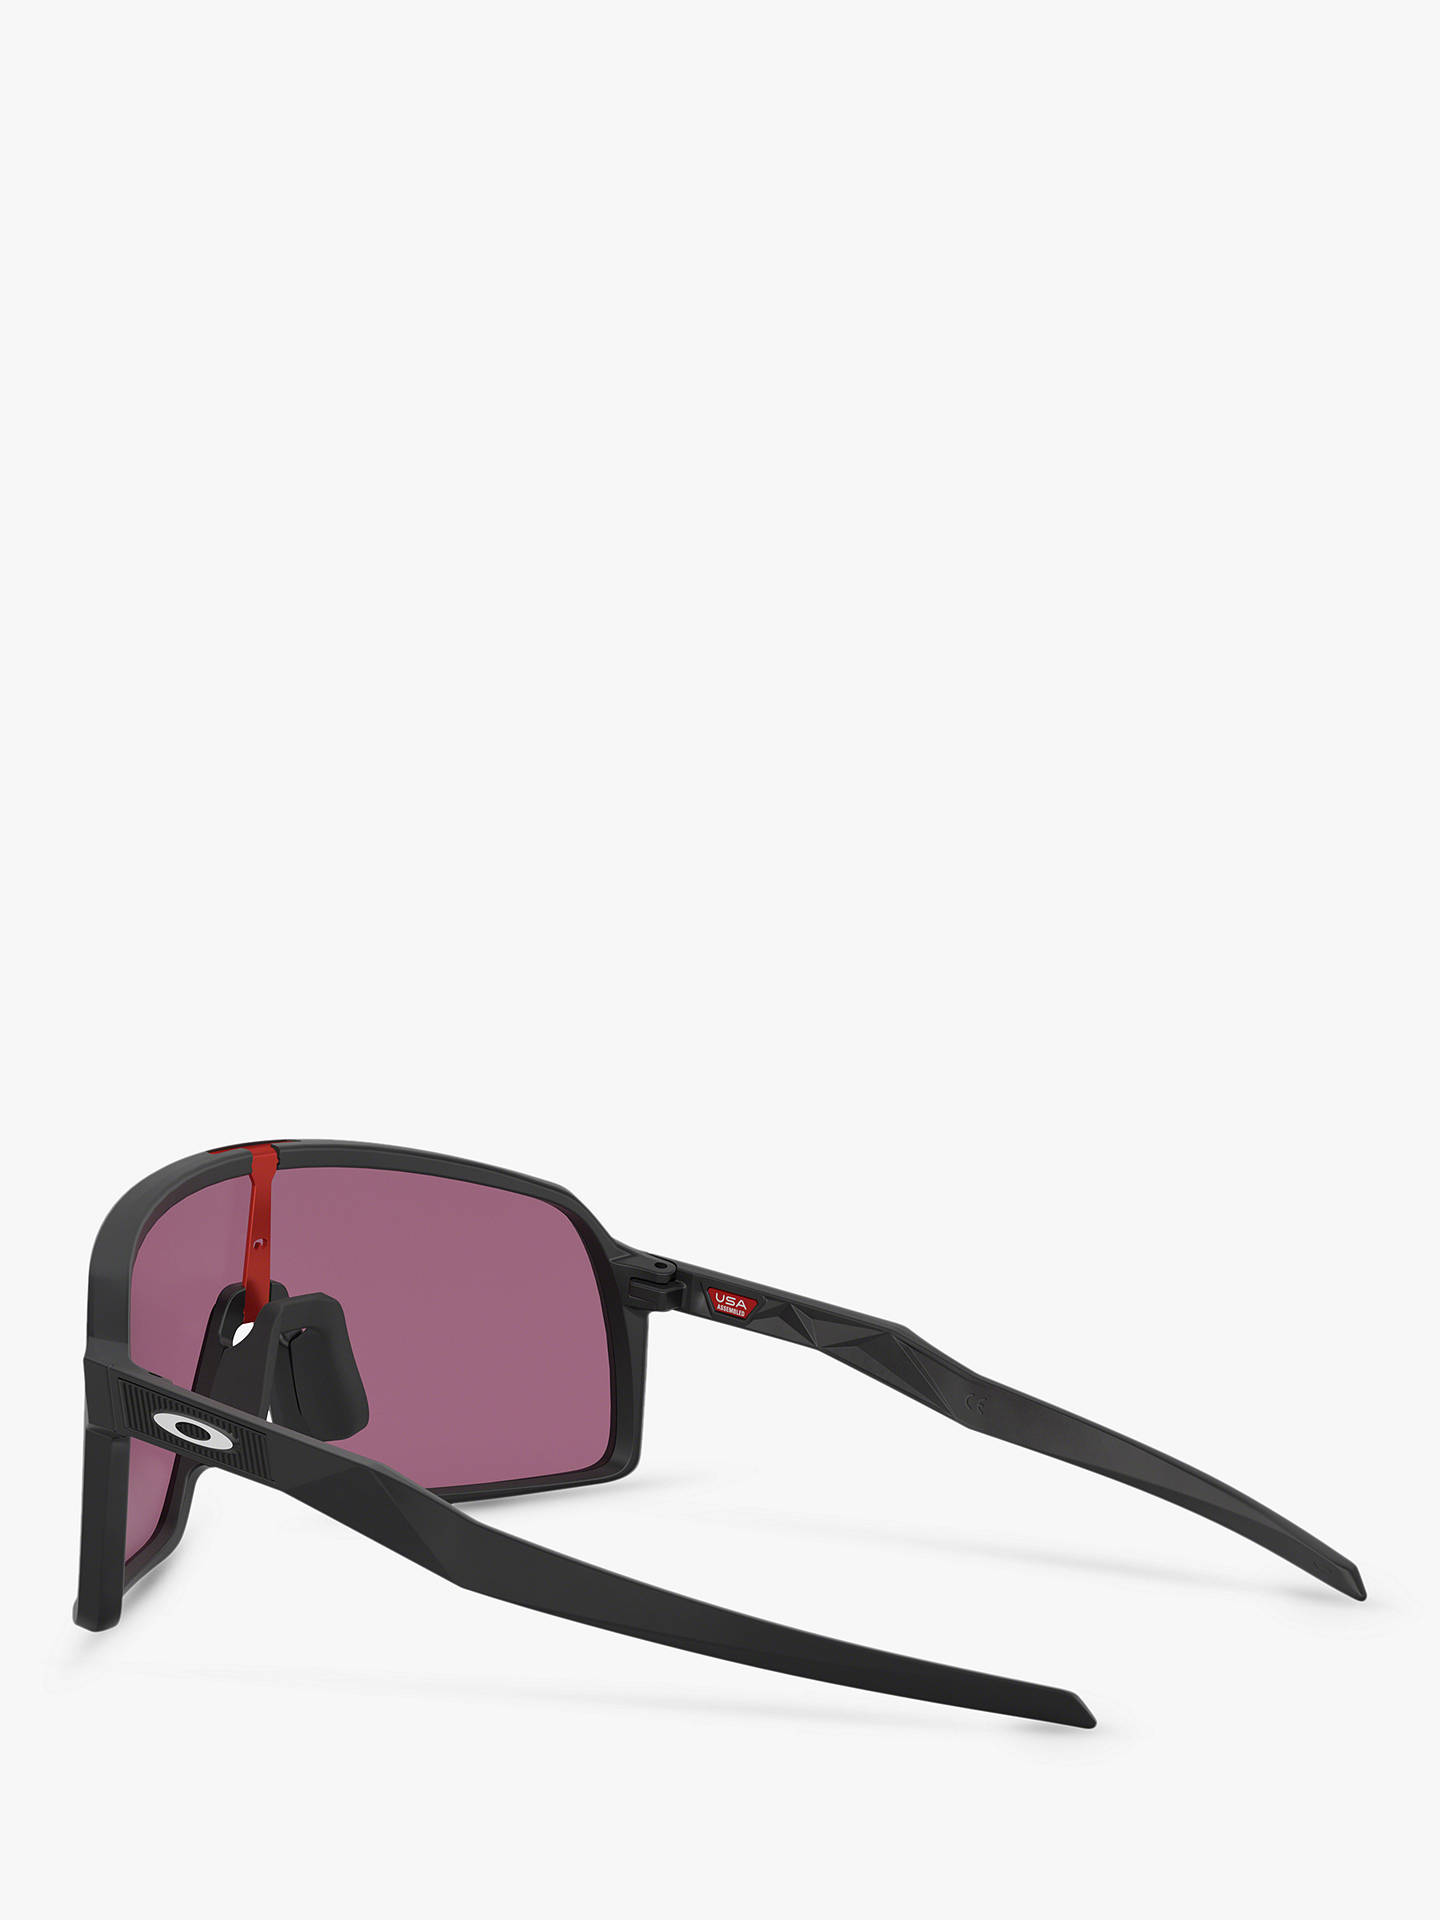 18151f3e079bd Oakley OO9406 Men s Sutro Prizm Rectangular Sunglasses at John Lewis ...